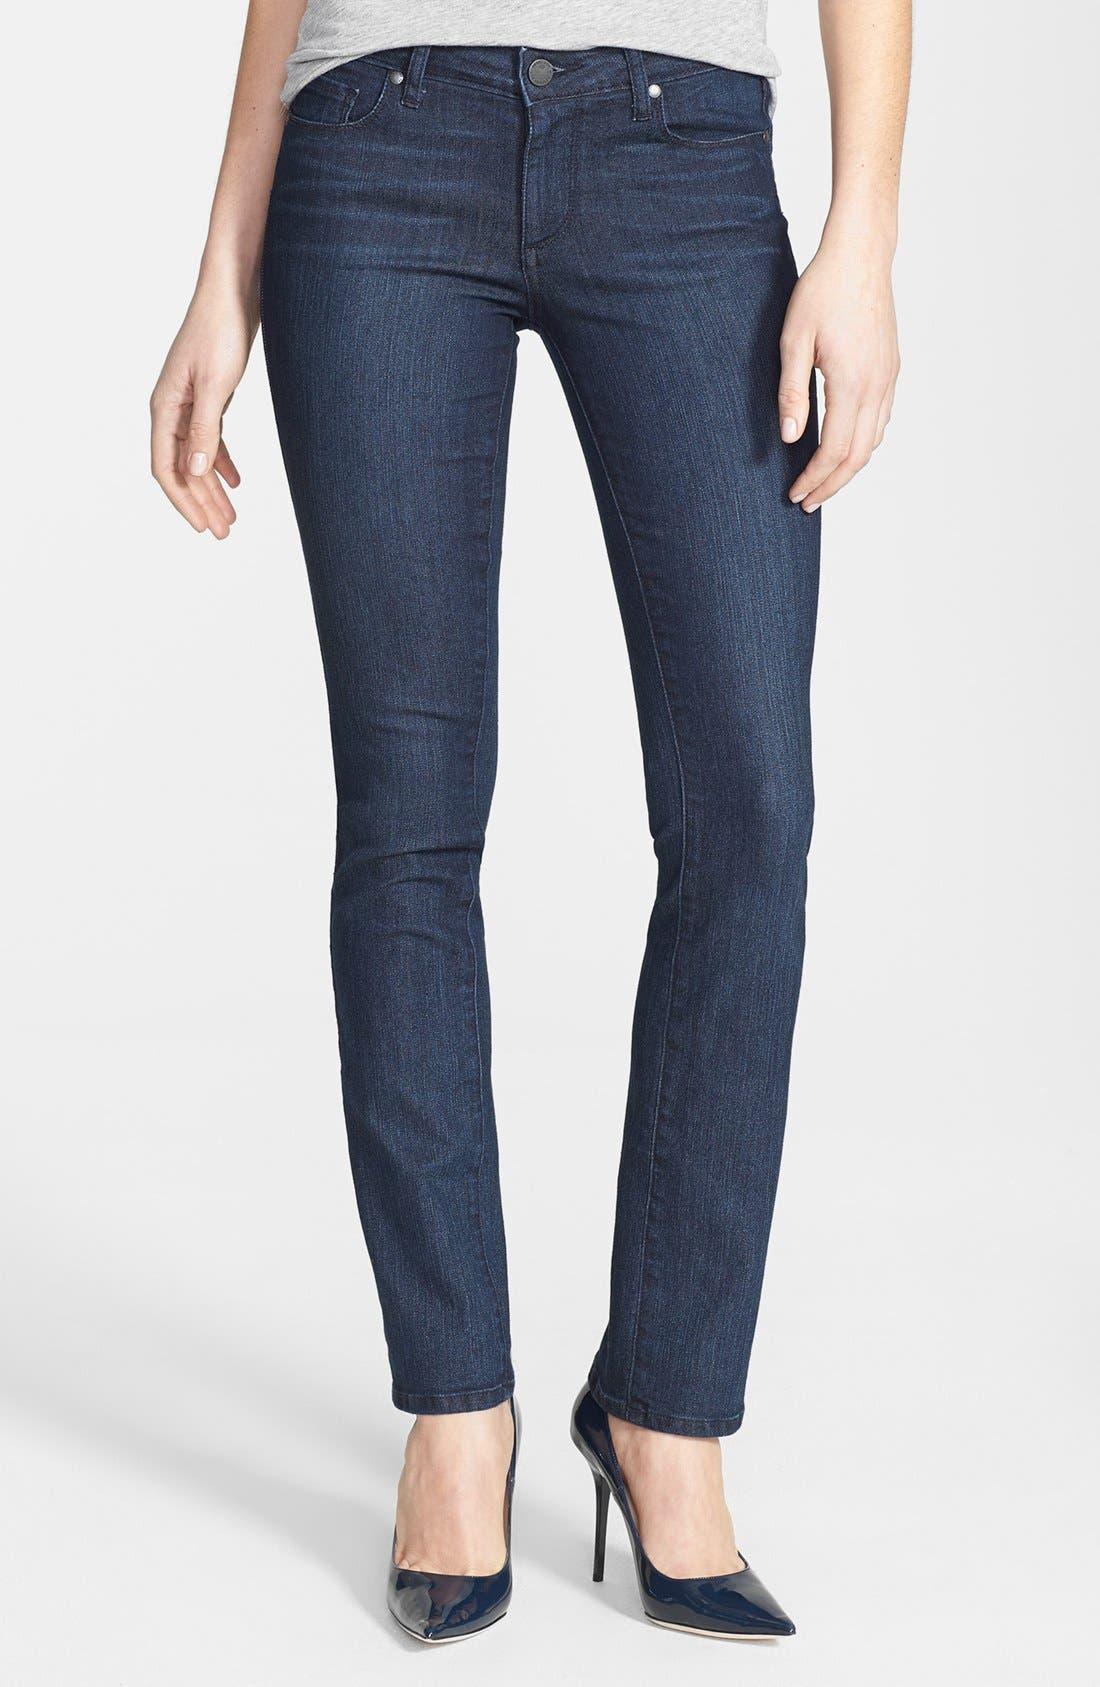 Alternate Image 1 Selected - Paige Denim 'Skyline' Straight Leg Jeans (Manchester) (Petite)